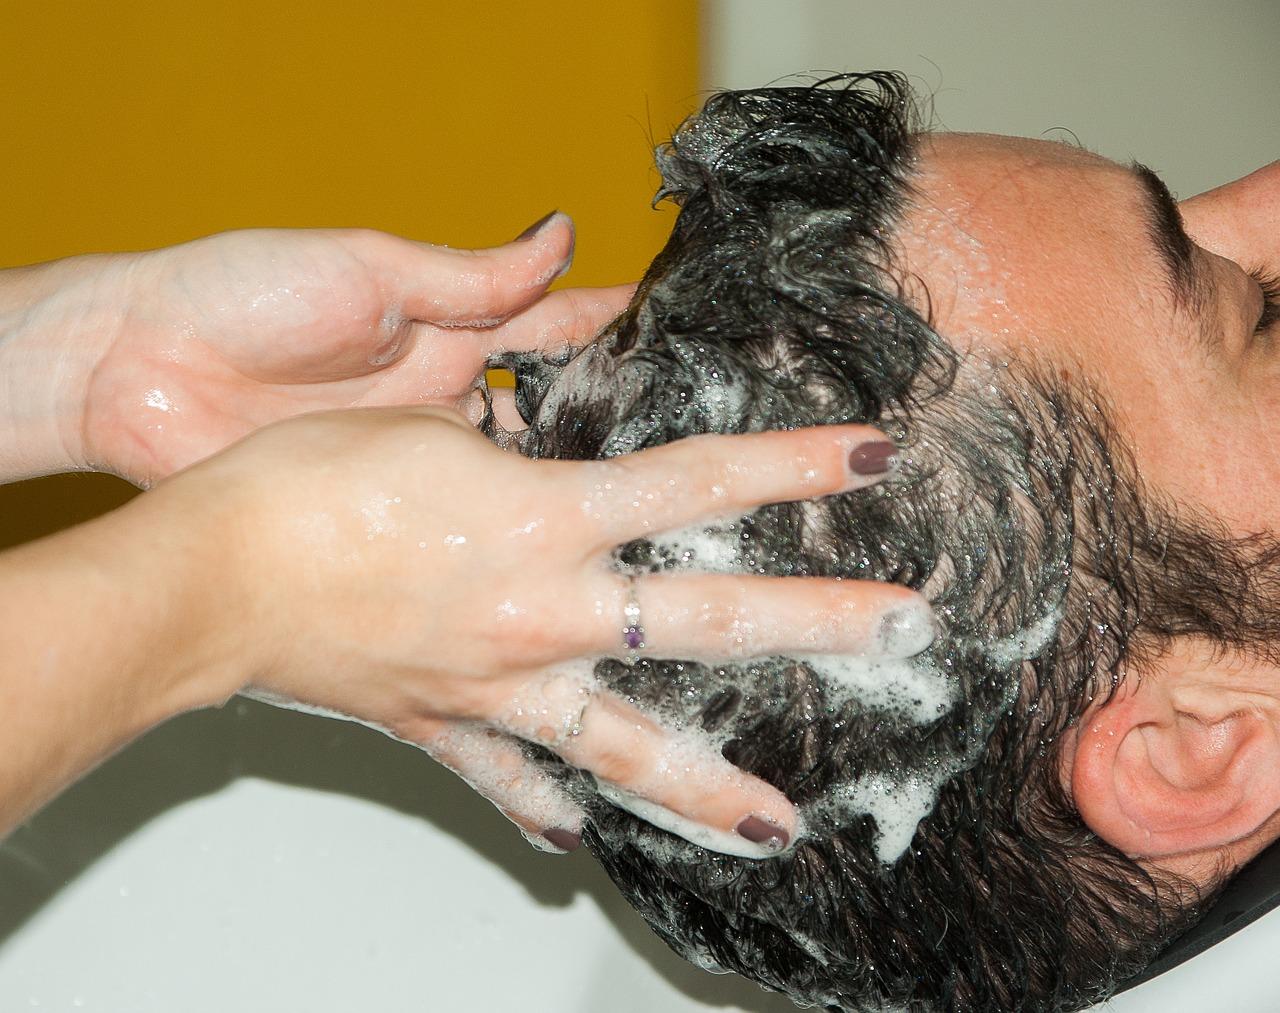 A pikkelysömör a bőrt, hajas fejbőrt, körmöket érintő bőrbetegs